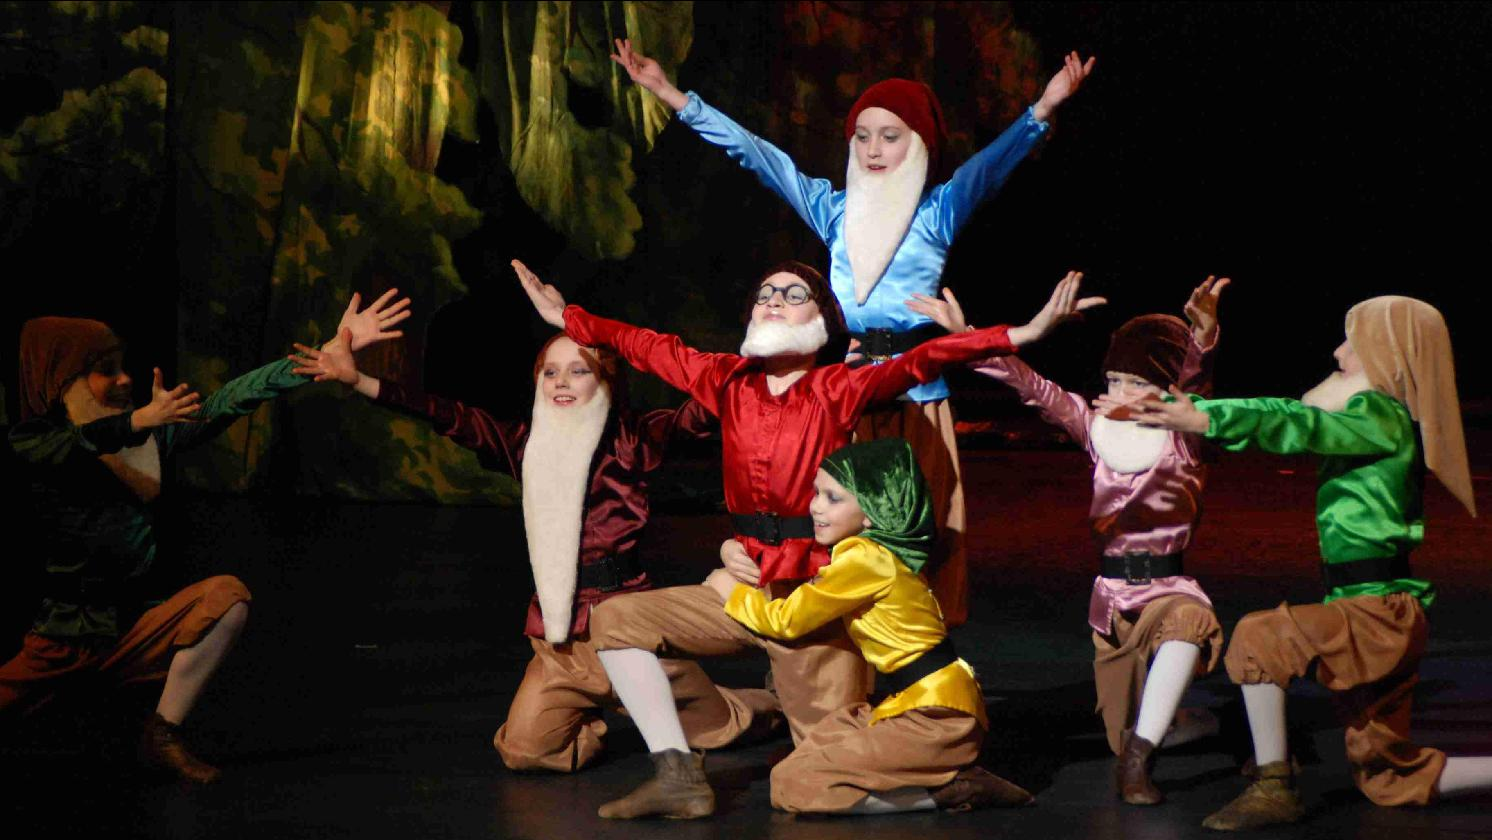 Snow White & 7 dwarfs ballet